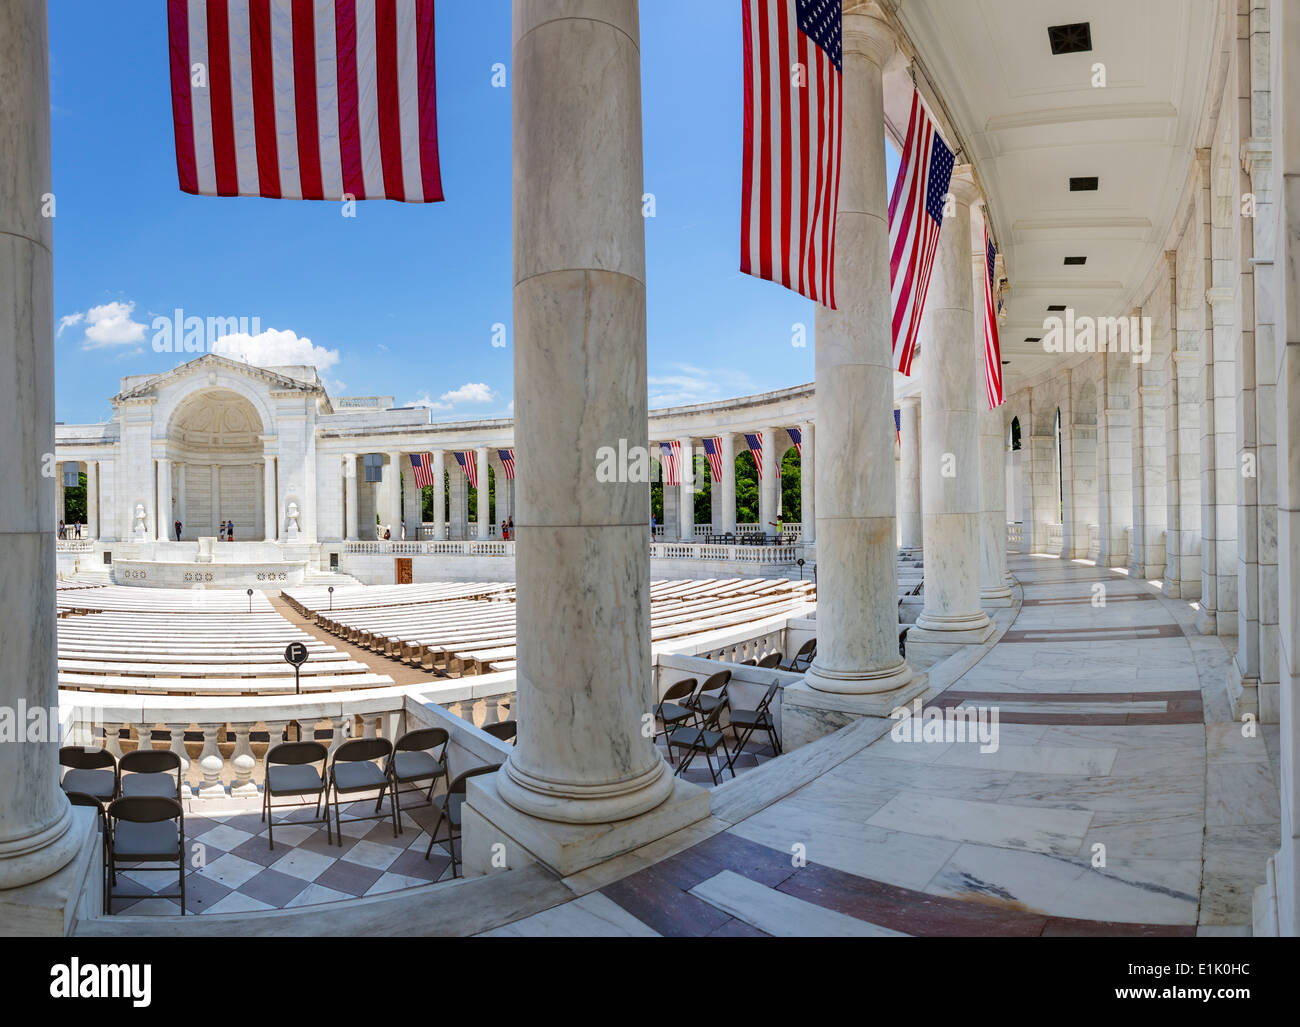 The Amphitheater at Arlington National Cemetery near Washington DC, Arlington, Virginia, USA - Stock Image